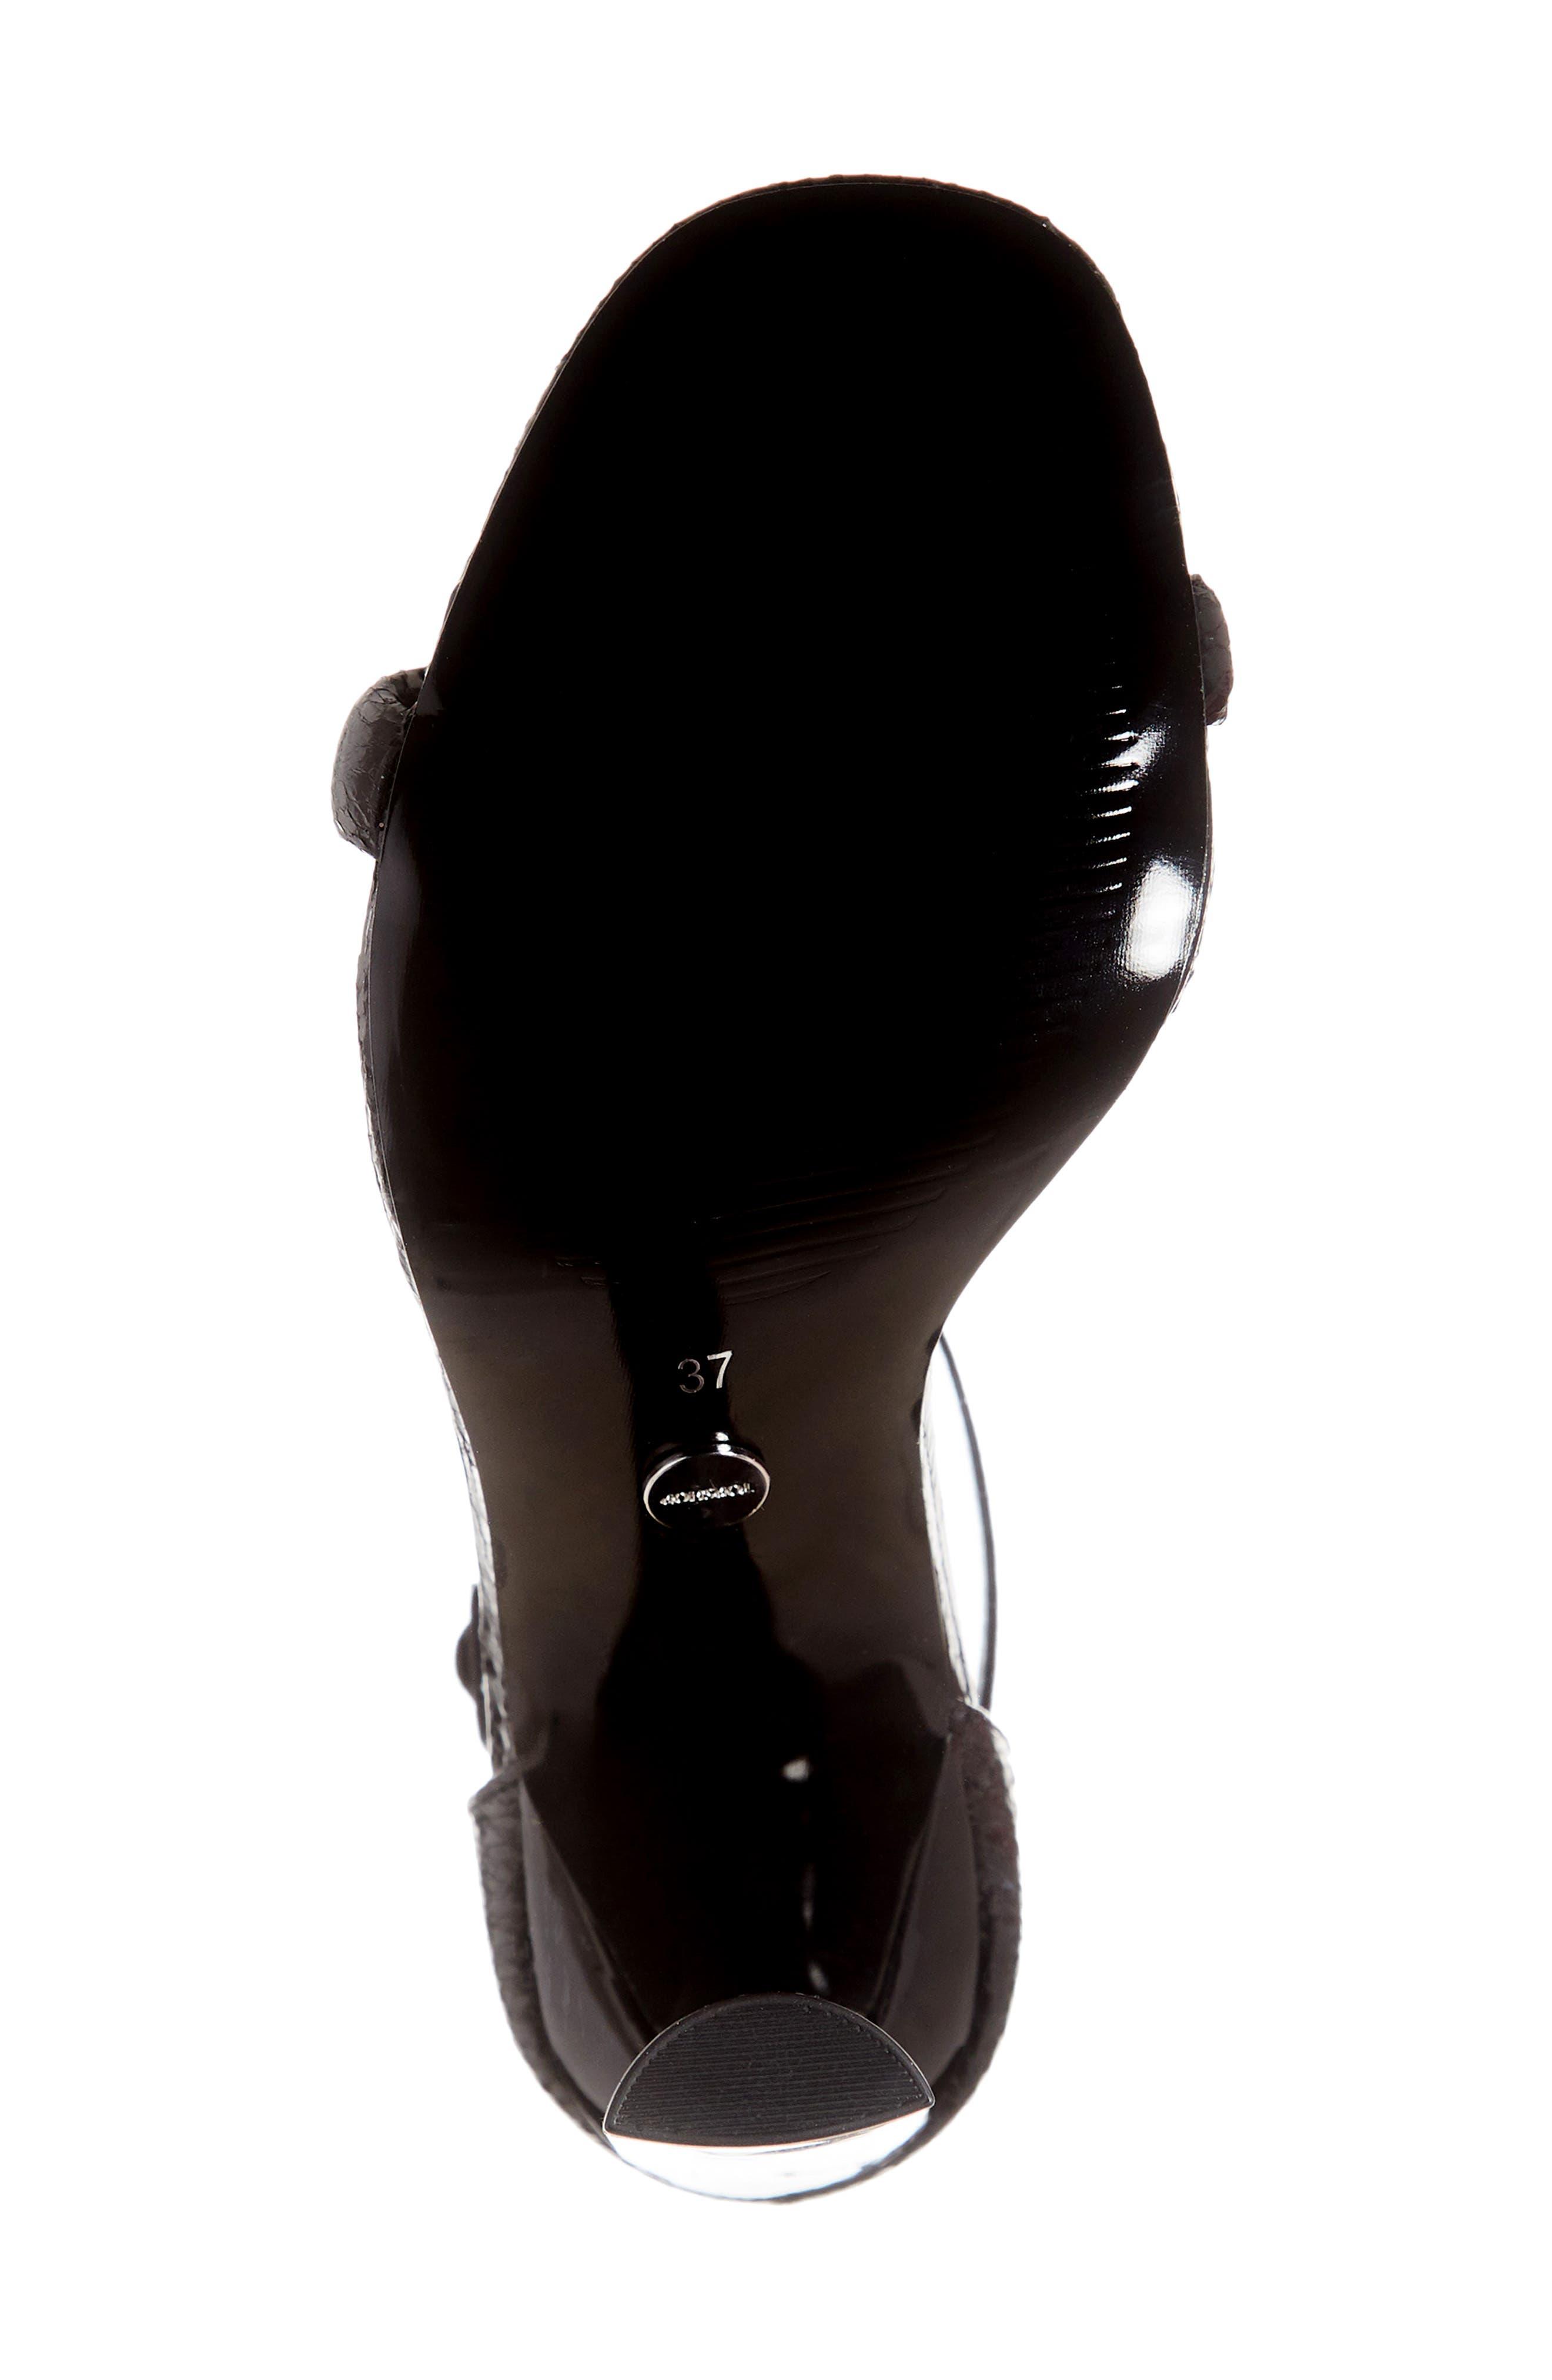 TOPSHOP, Robyn Ankle Strap Sandal, Alternate thumbnail 6, color, BLACK